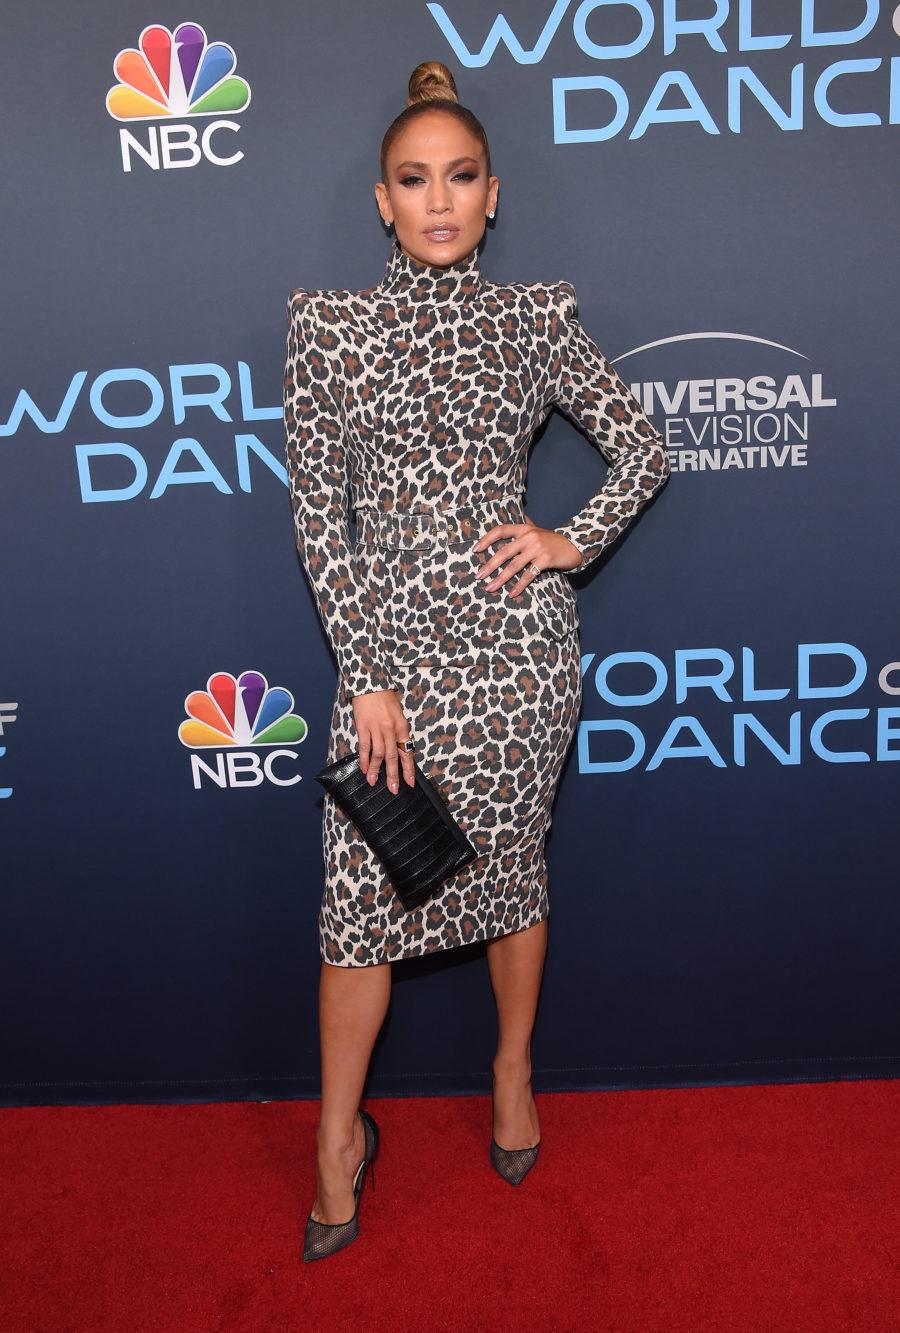 This weeks best dressed list features Zendaya, Jennifer Lopez, Dakota Johnson, Kendall Jenner and Mandy Moore